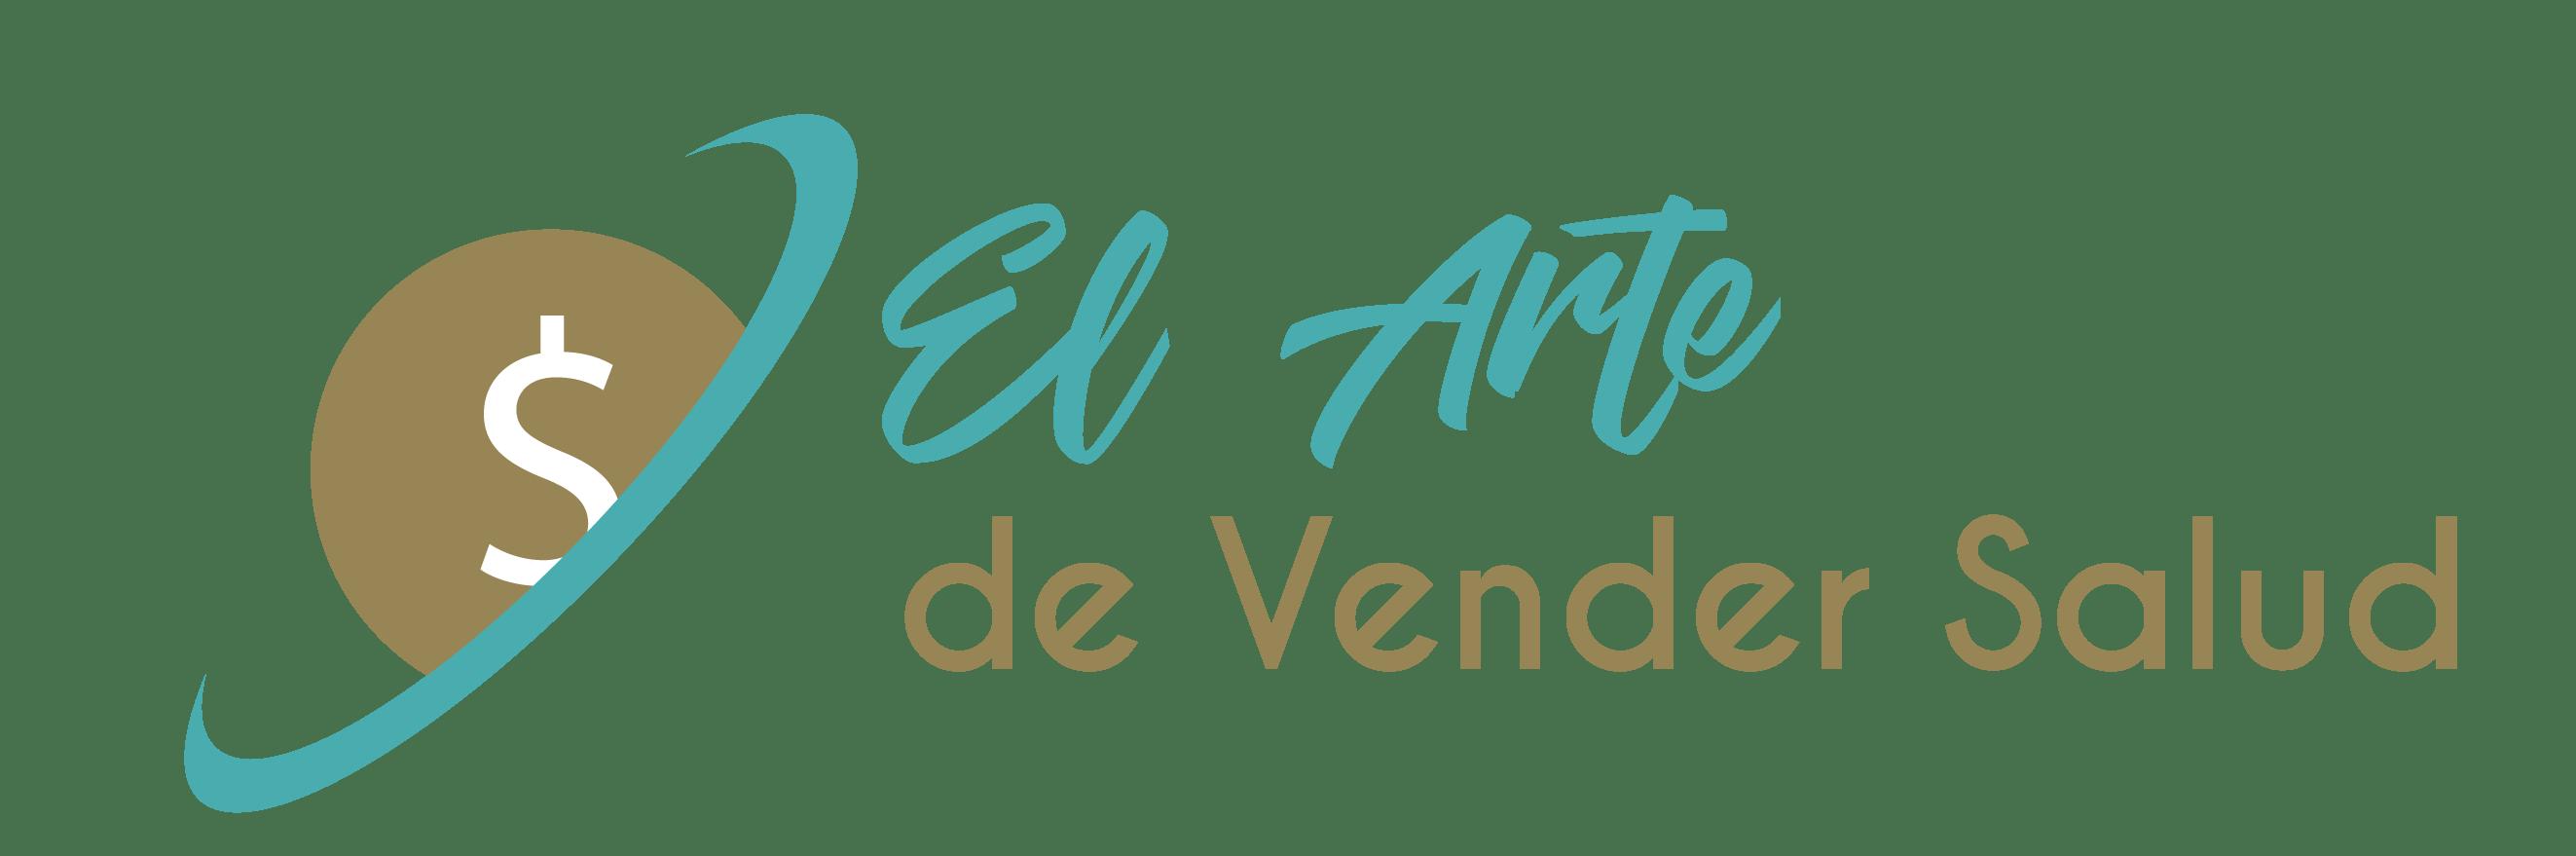 El-Arte-de-Vender-Salud-transparente-1